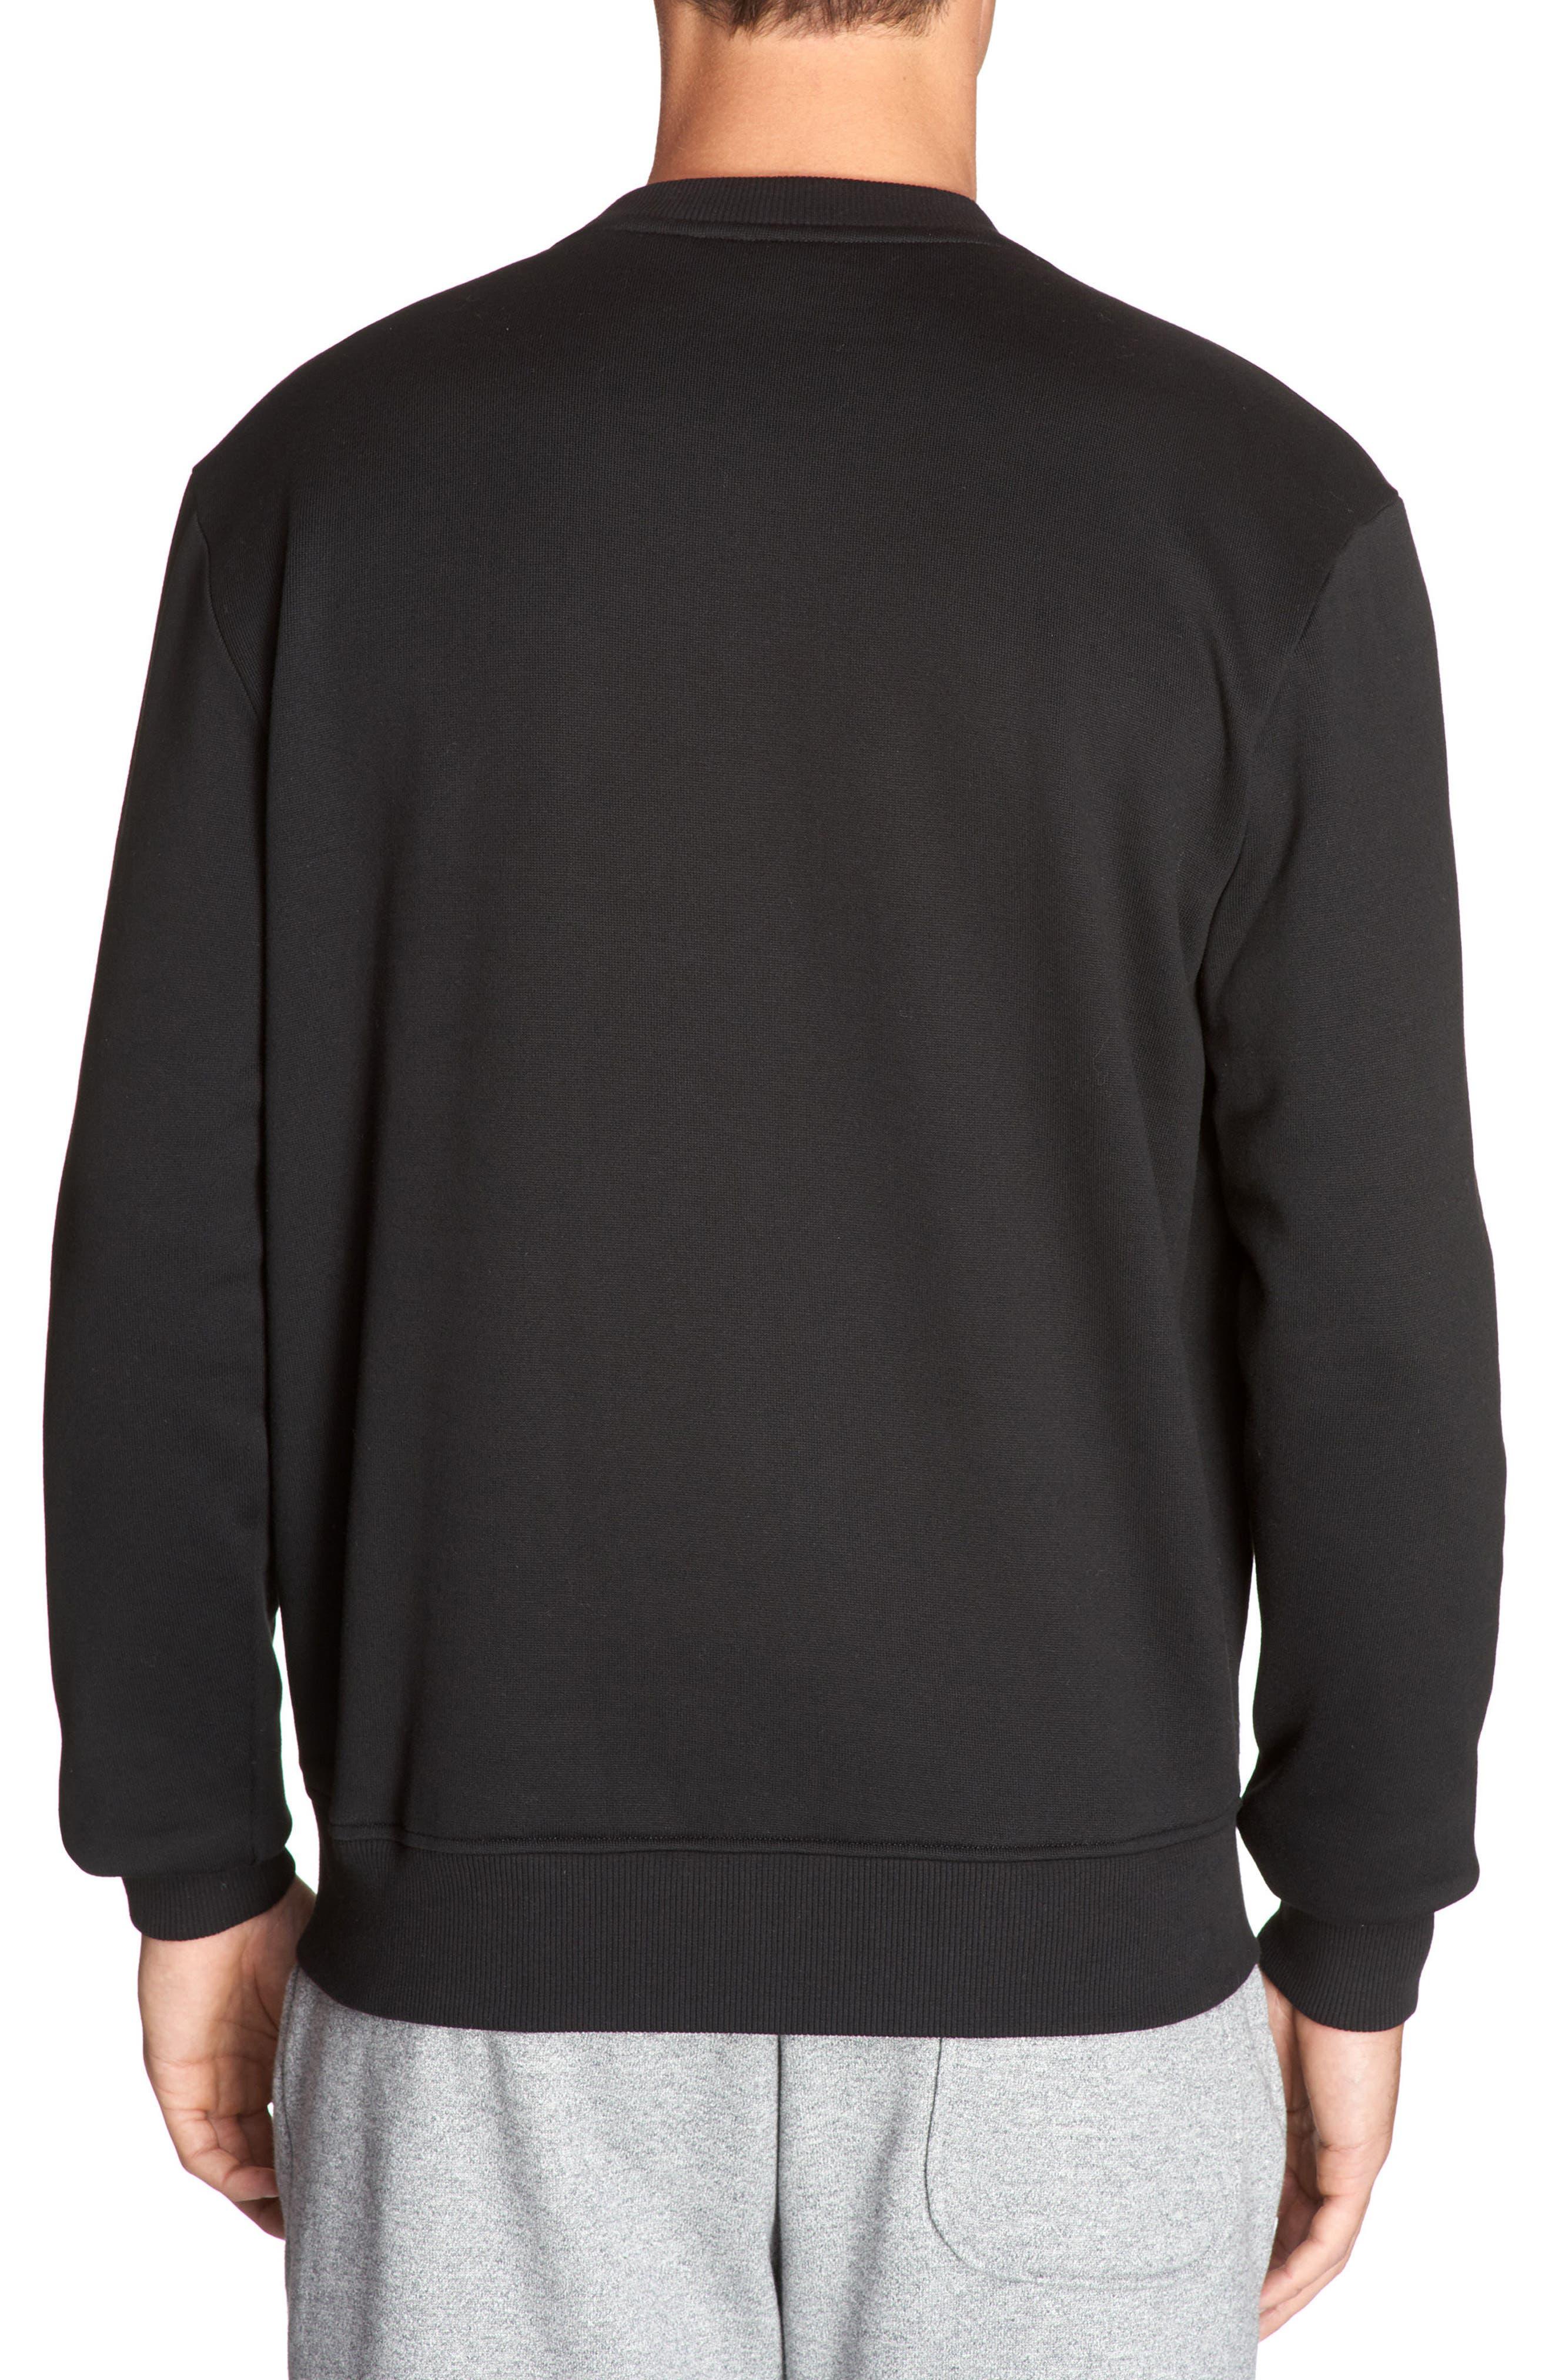 Molleton Worldwide Sweatshirt,                             Alternate thumbnail 2, color,                             003